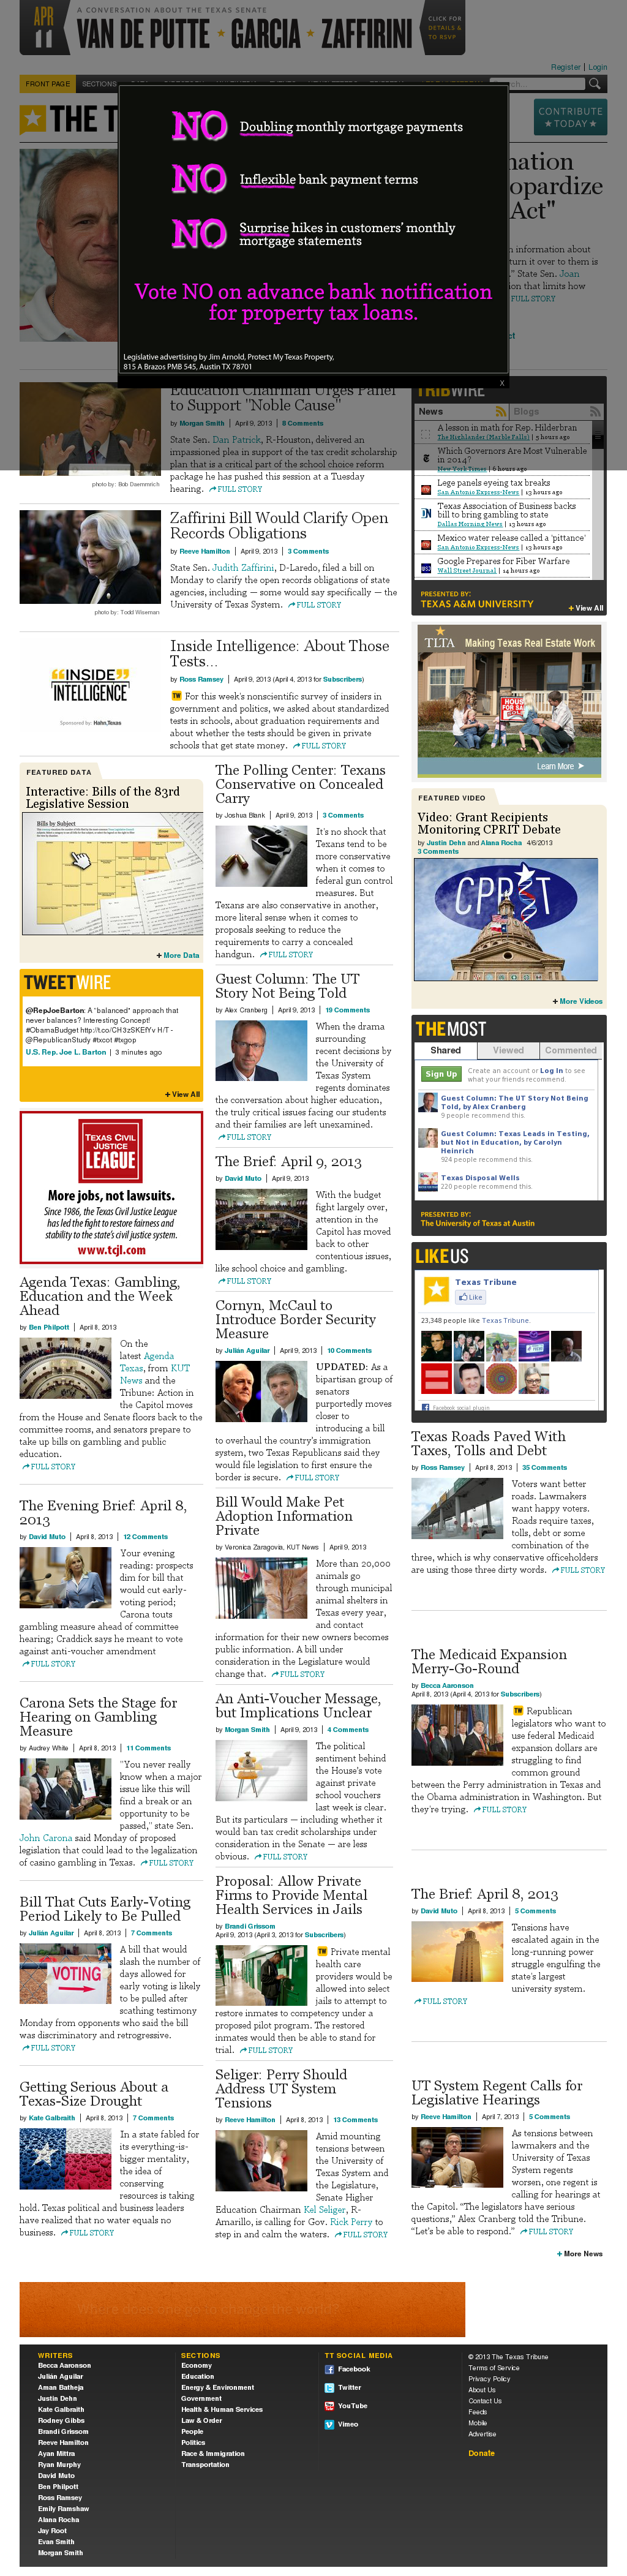 The Texas Tribune at Tuesday April 9, 2013, 6:22 p.m. UTC